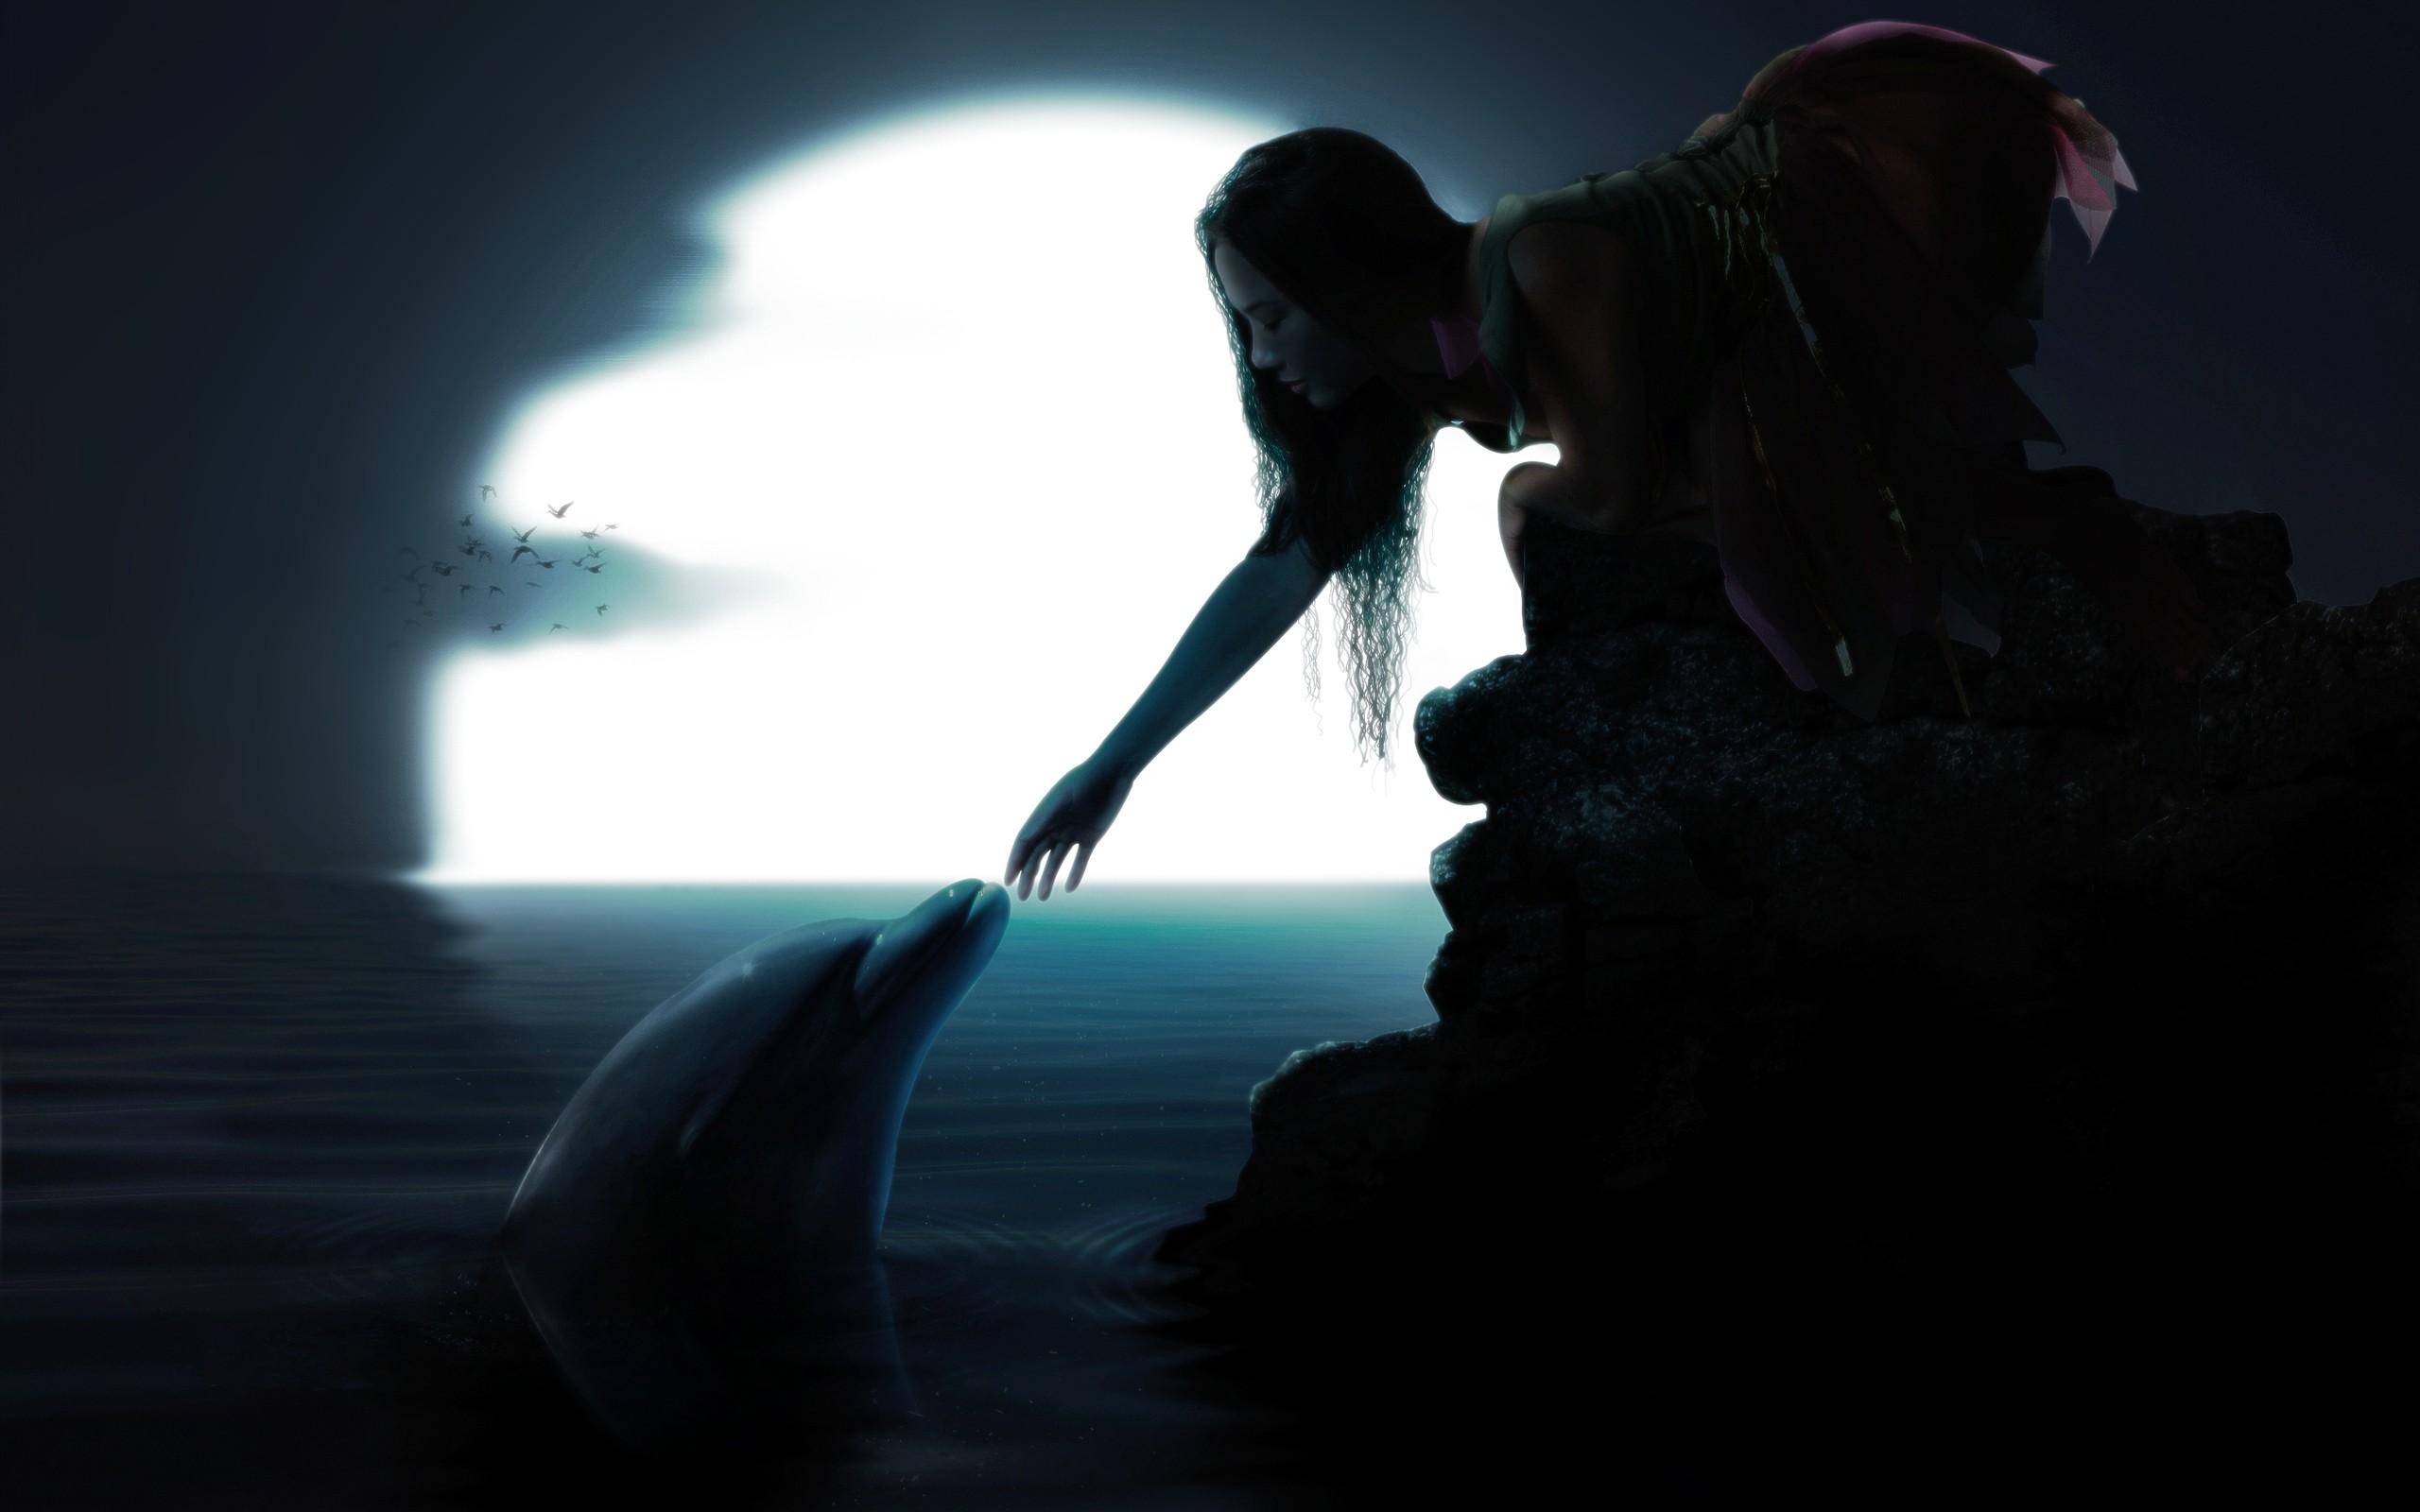 General 2560x1600 dolphin fantasy girl Moon fantasy art women dark mammals night animals sea